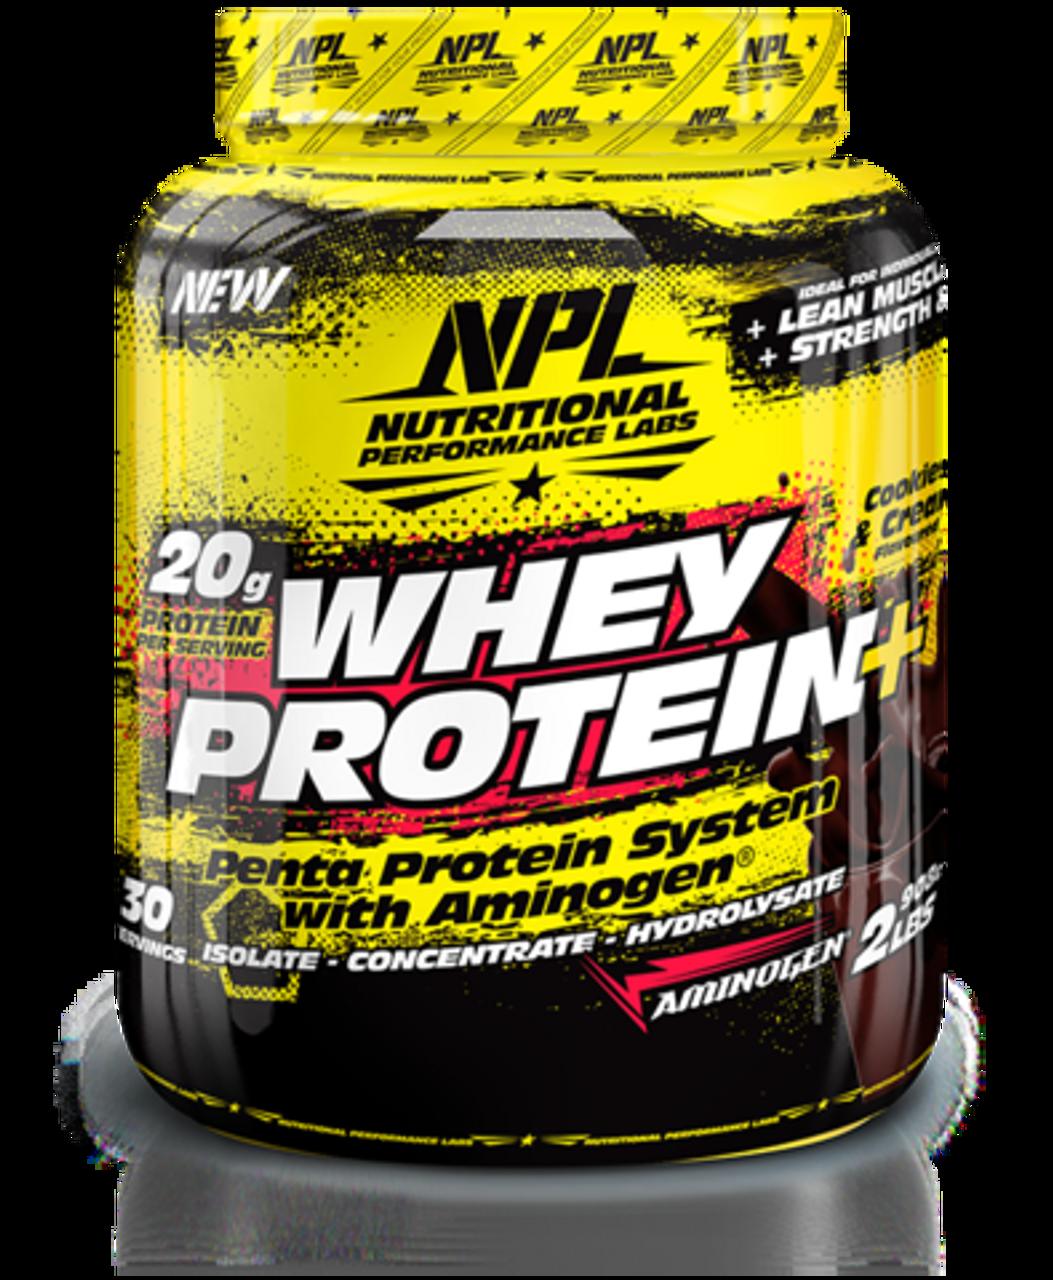 NPL Whey Protein Cookies & Cream